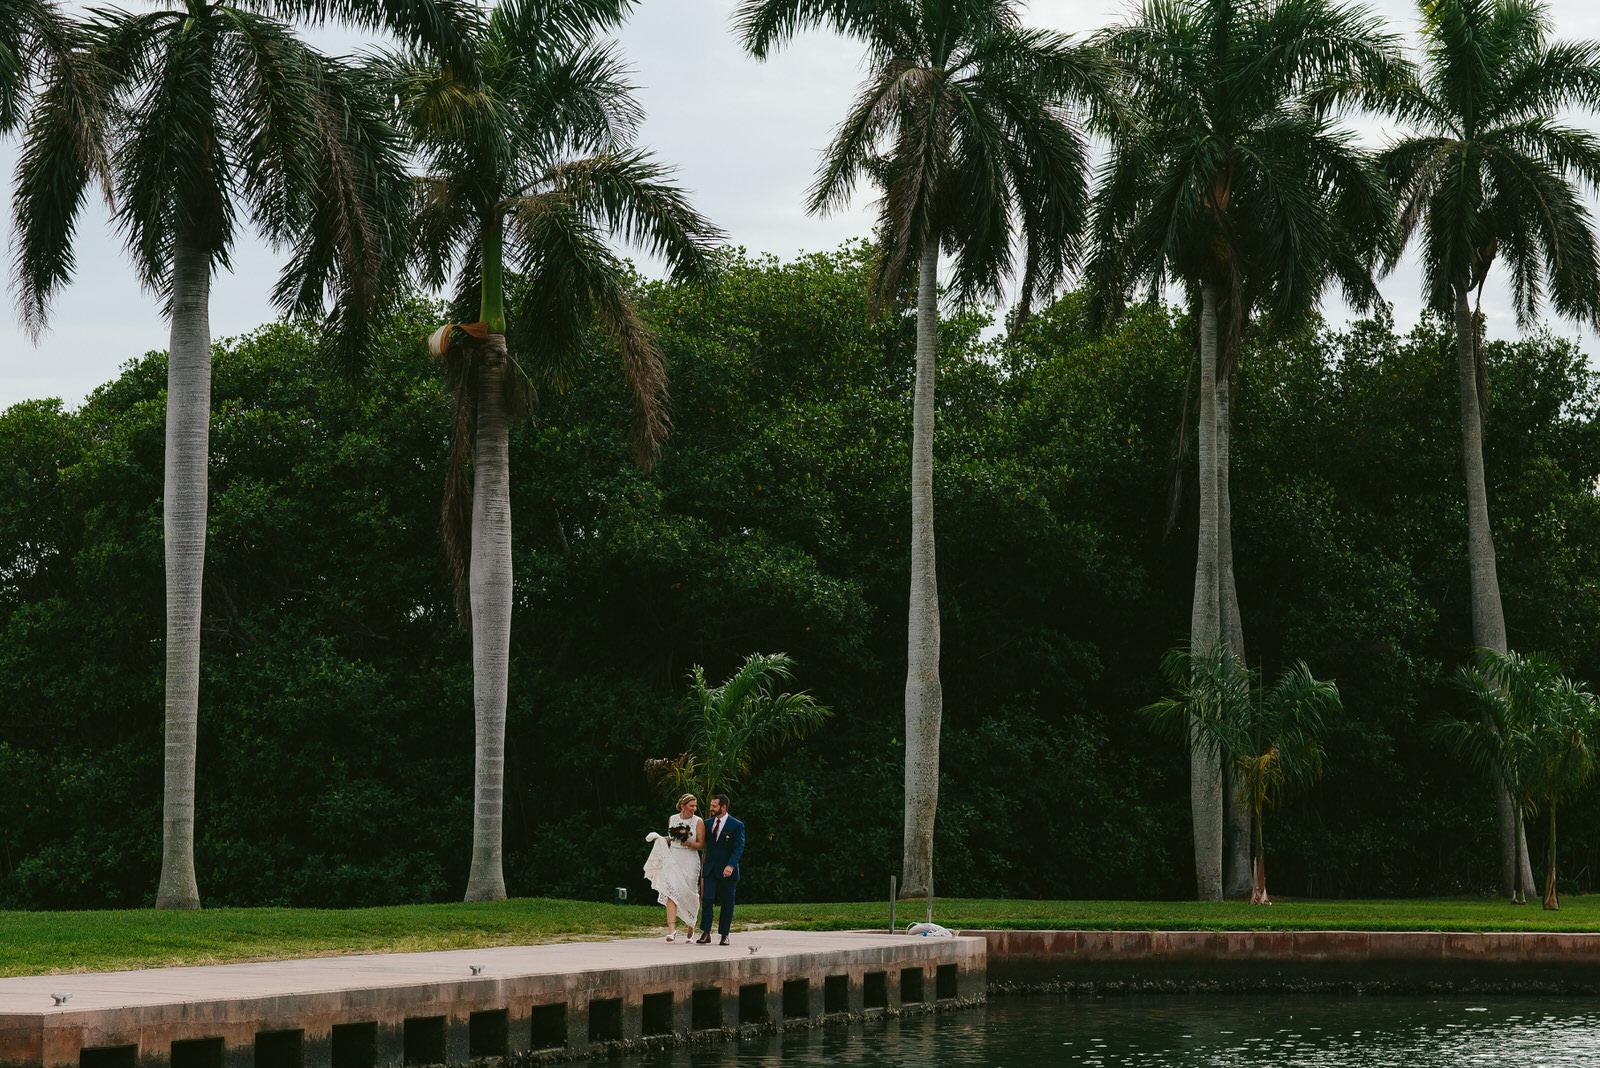 bride_groom_deering_estate_wedding_tiny_house_photo_miami_photographer-22.jpg